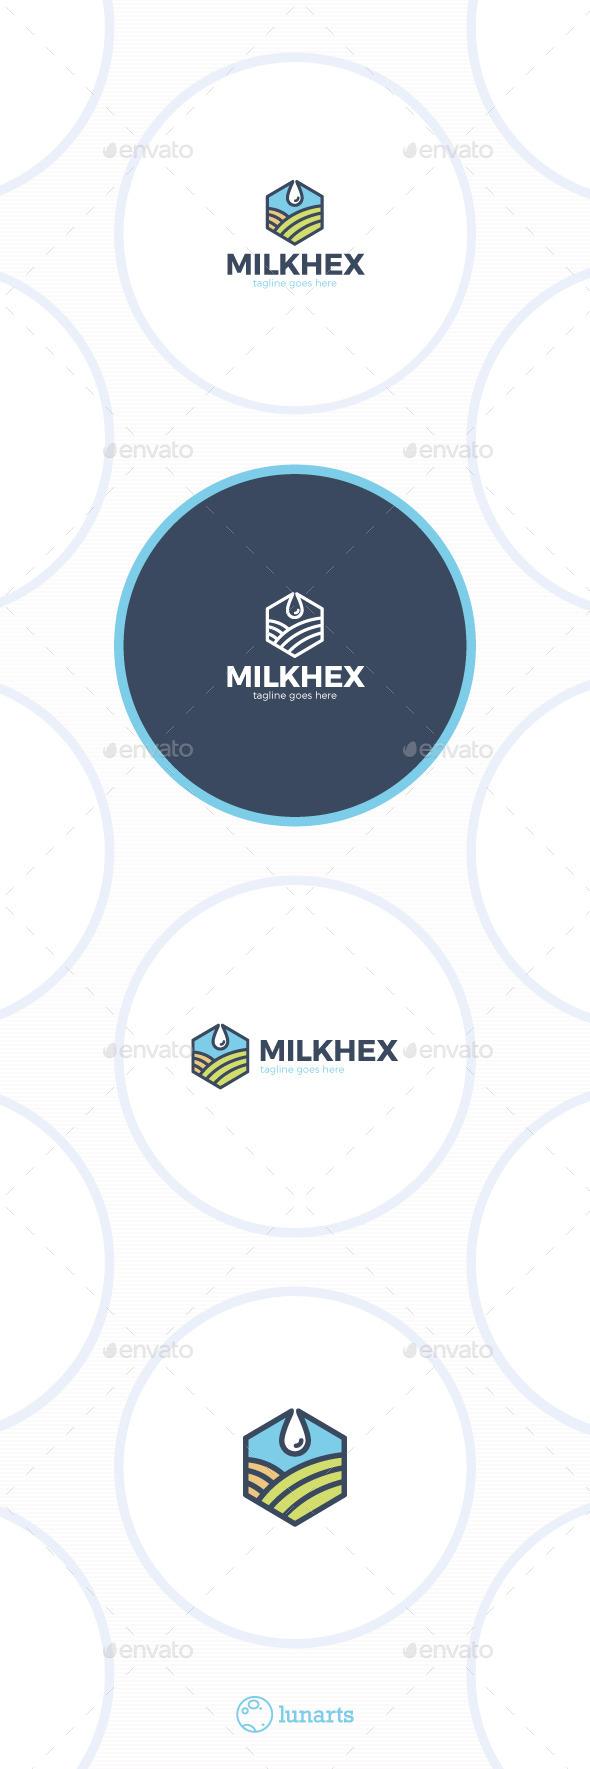 Hexagon Milk Logo - Drop Field - Nature Logo Templates